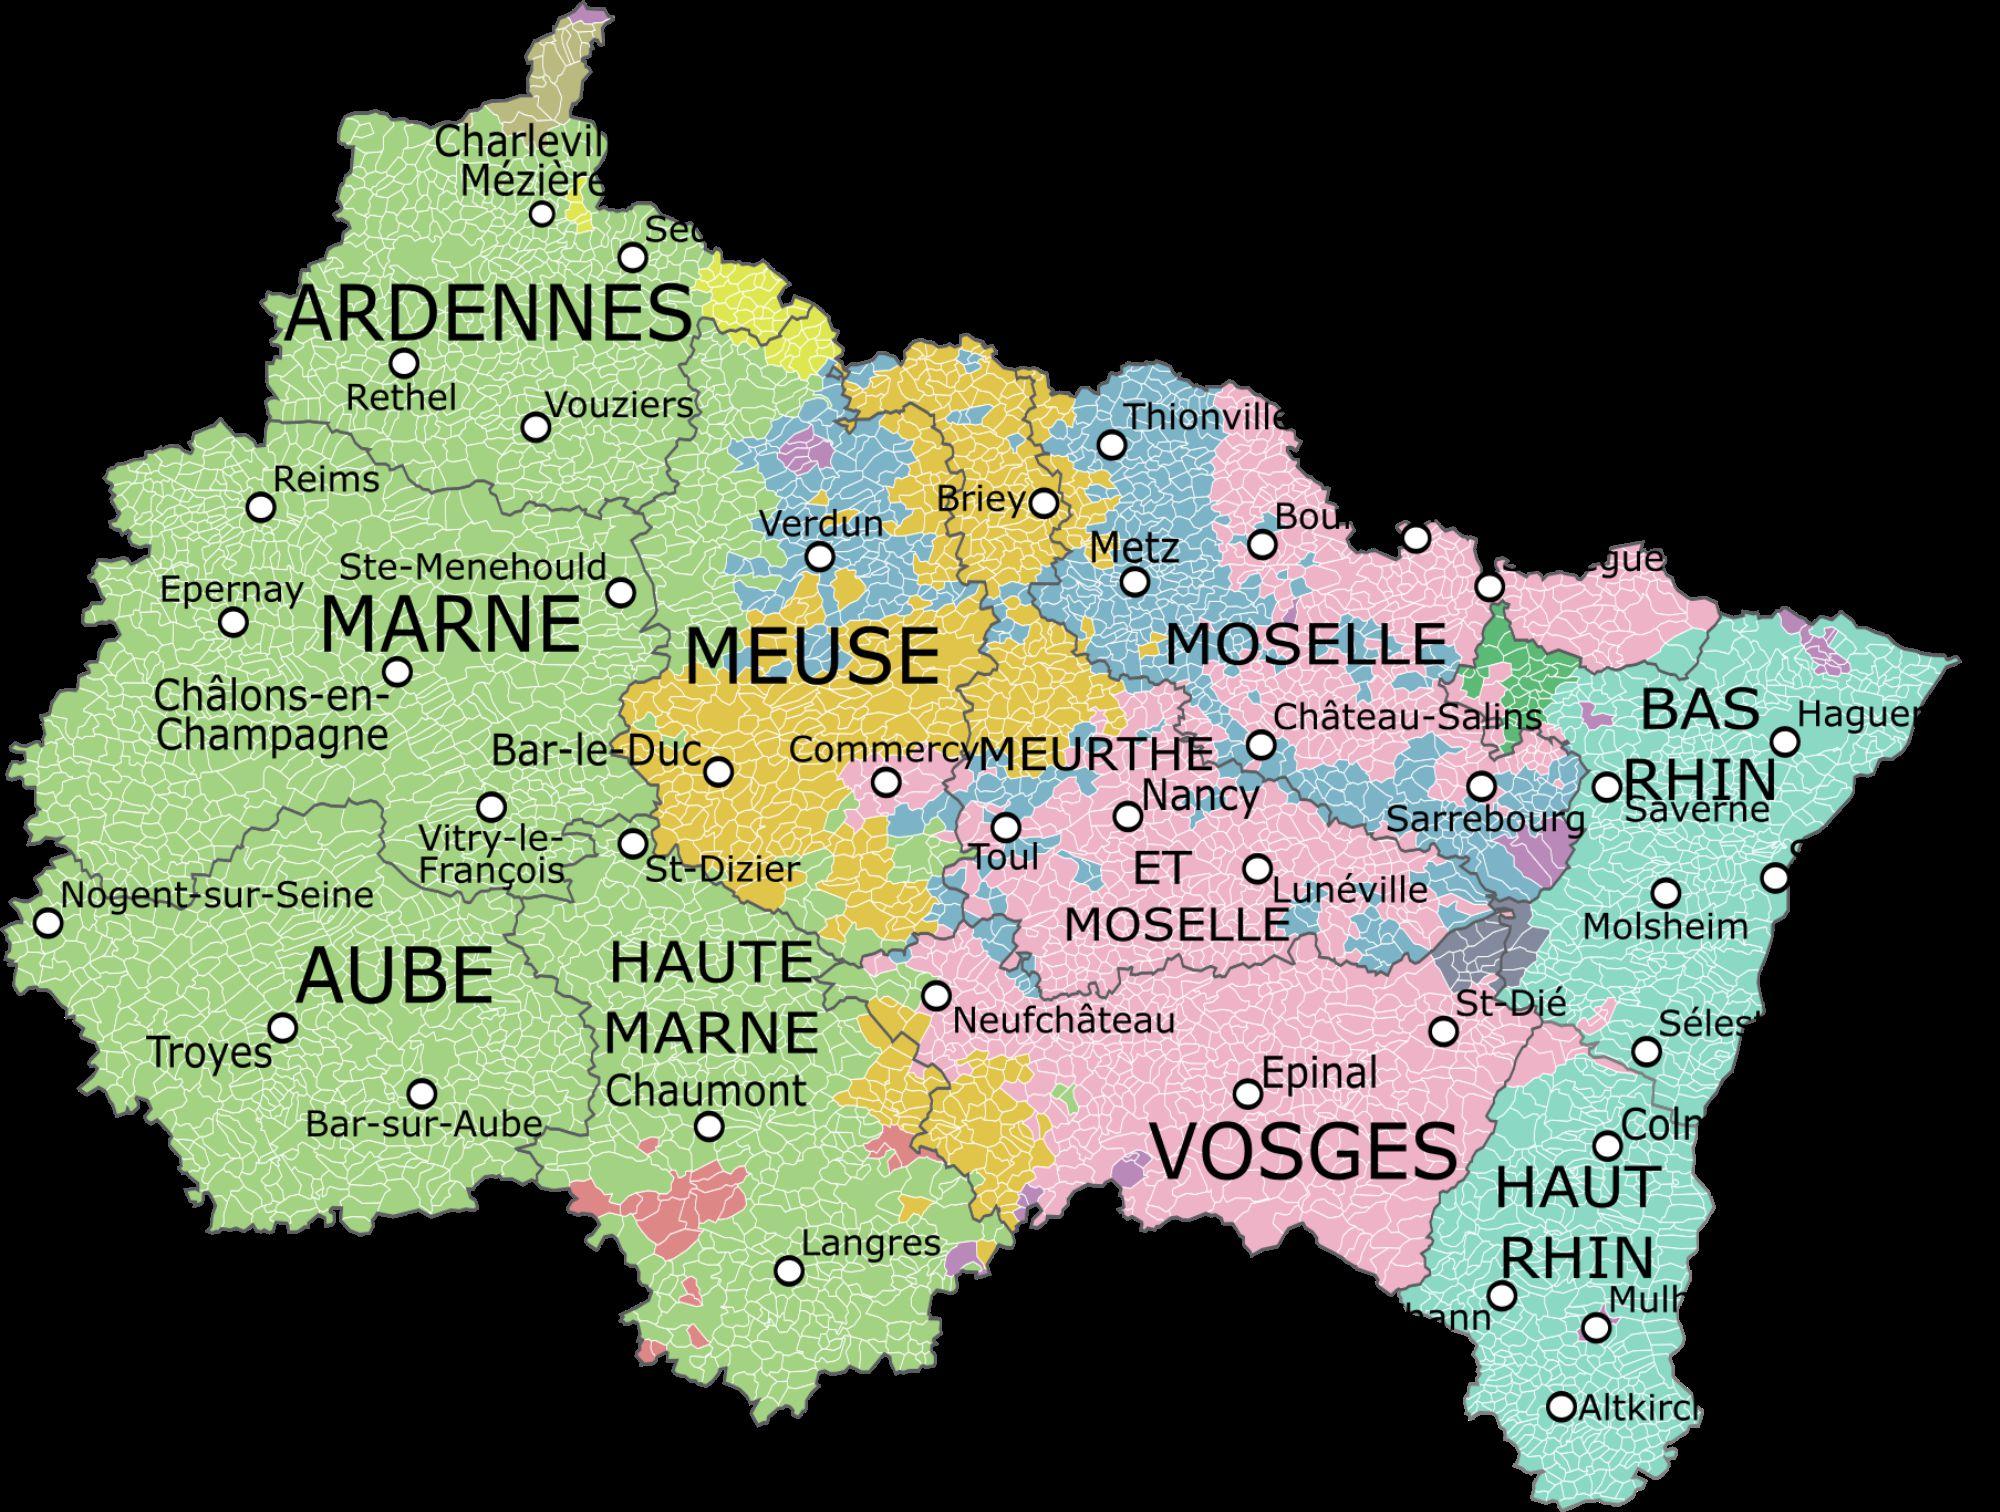 carte du grand est - Image